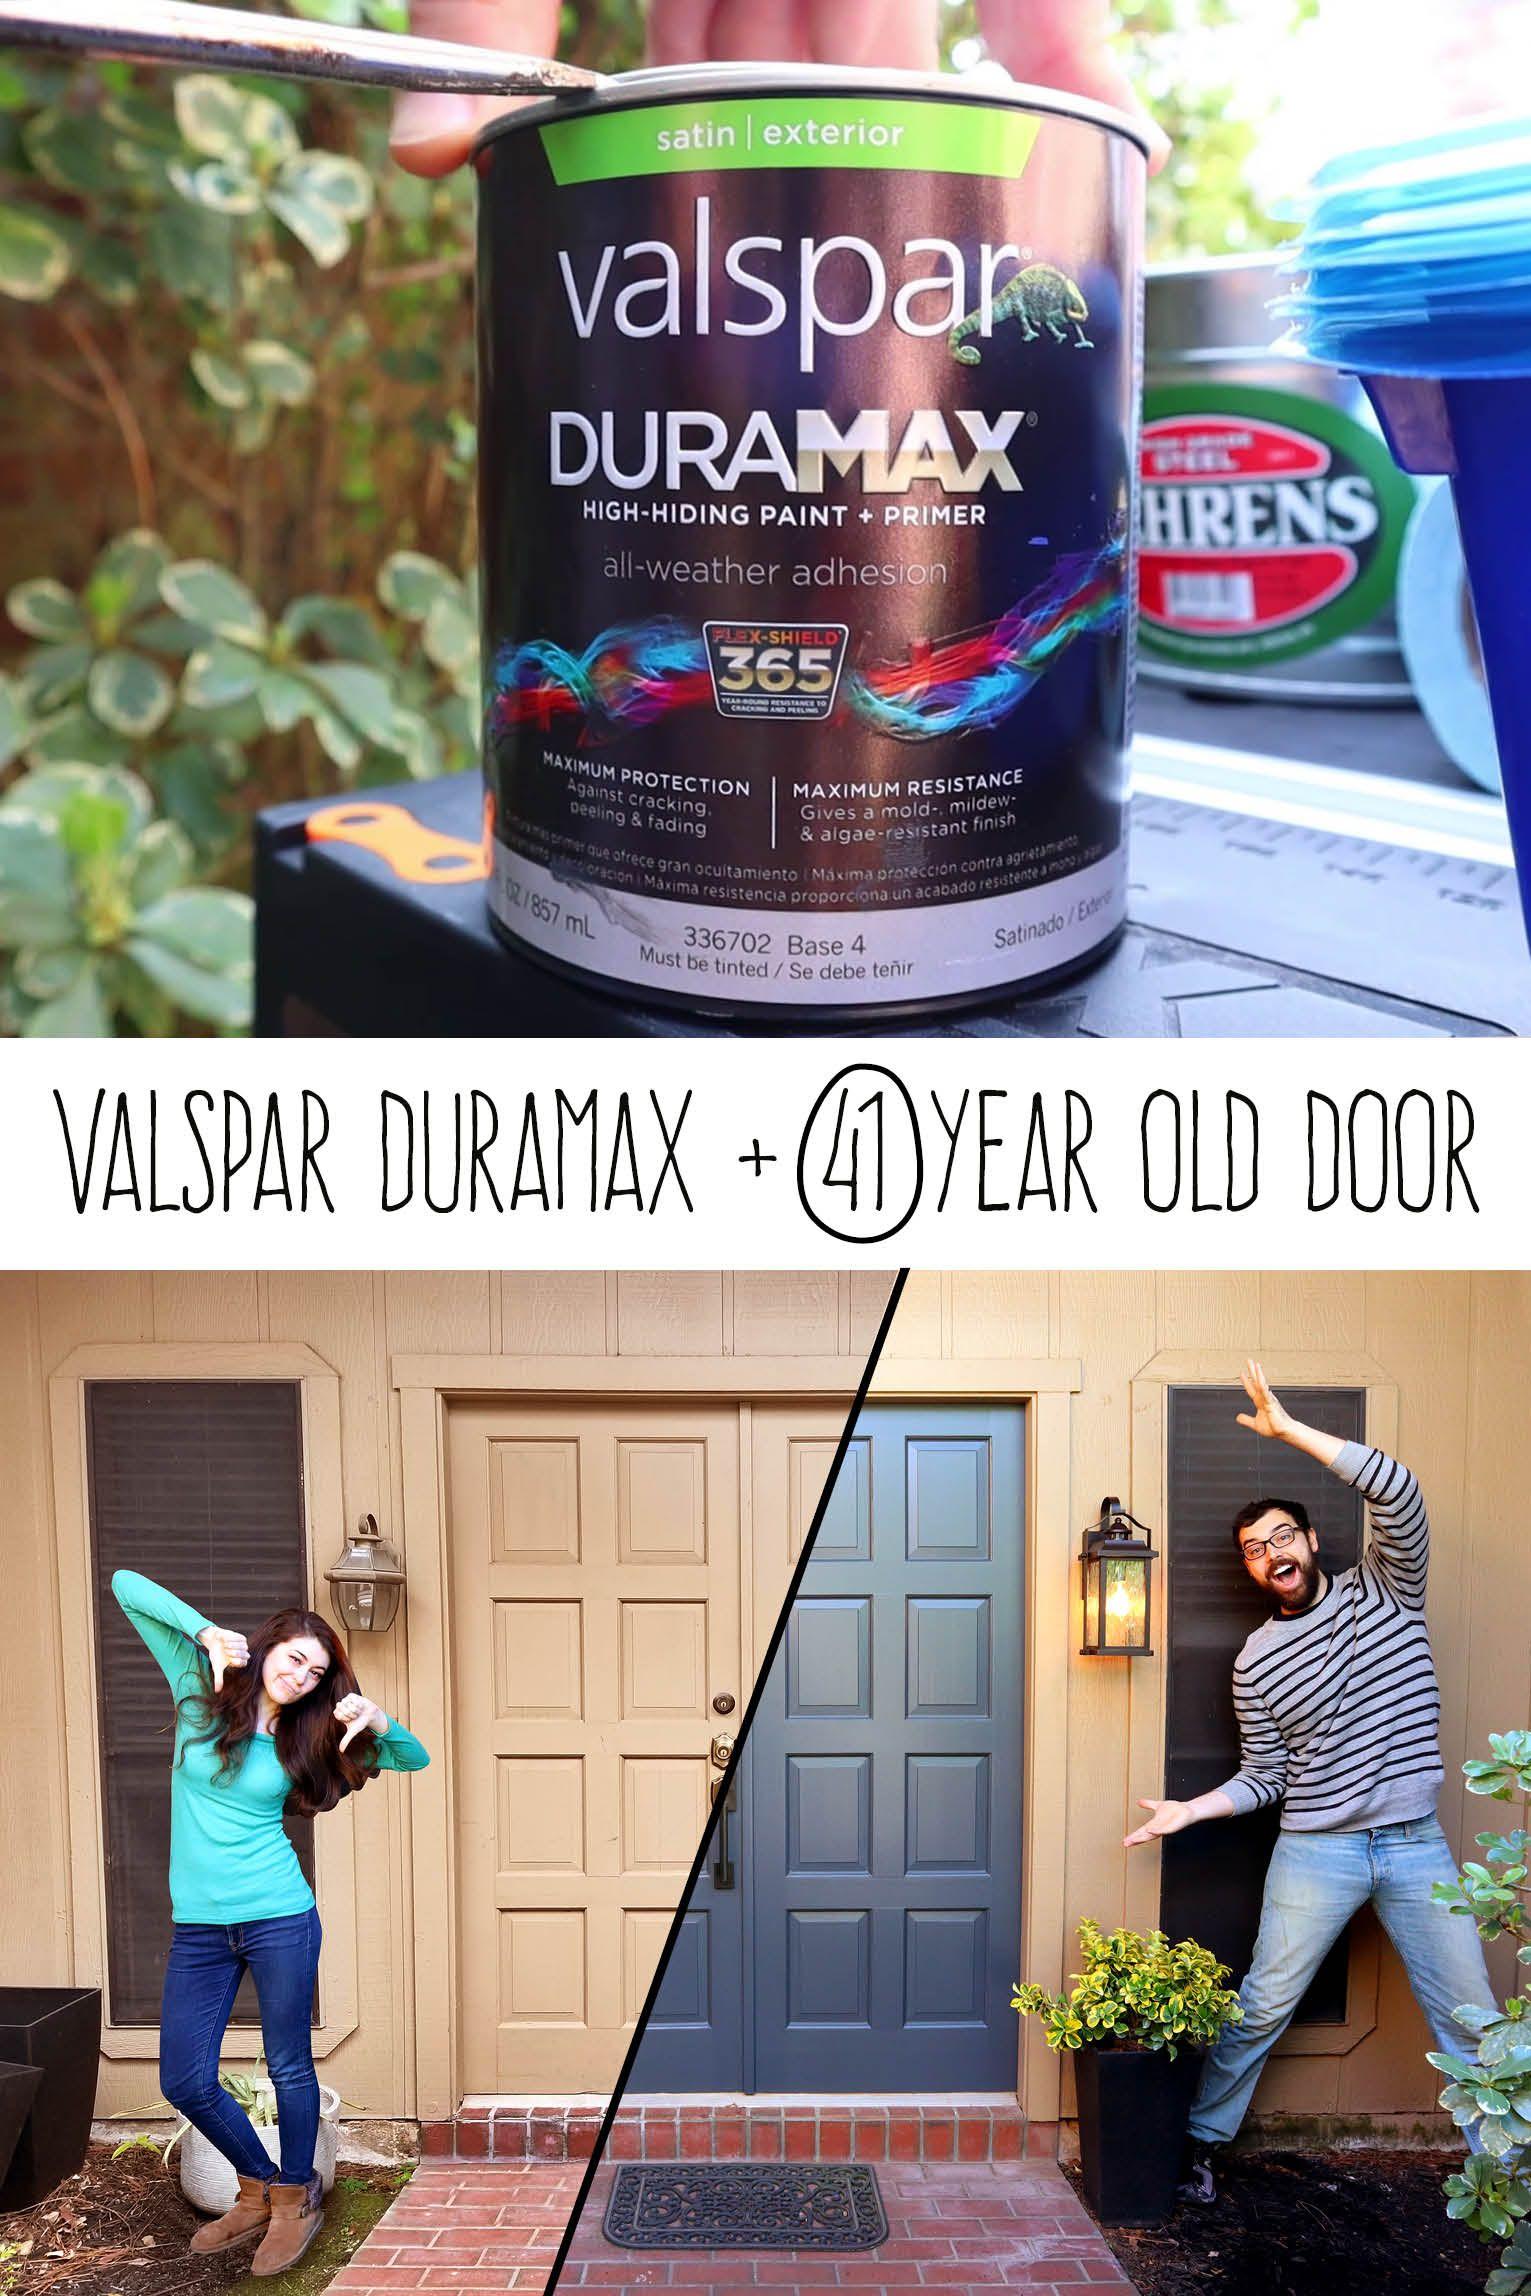 We Use Valspar Duramax In The Color Blindfold On Our Sad